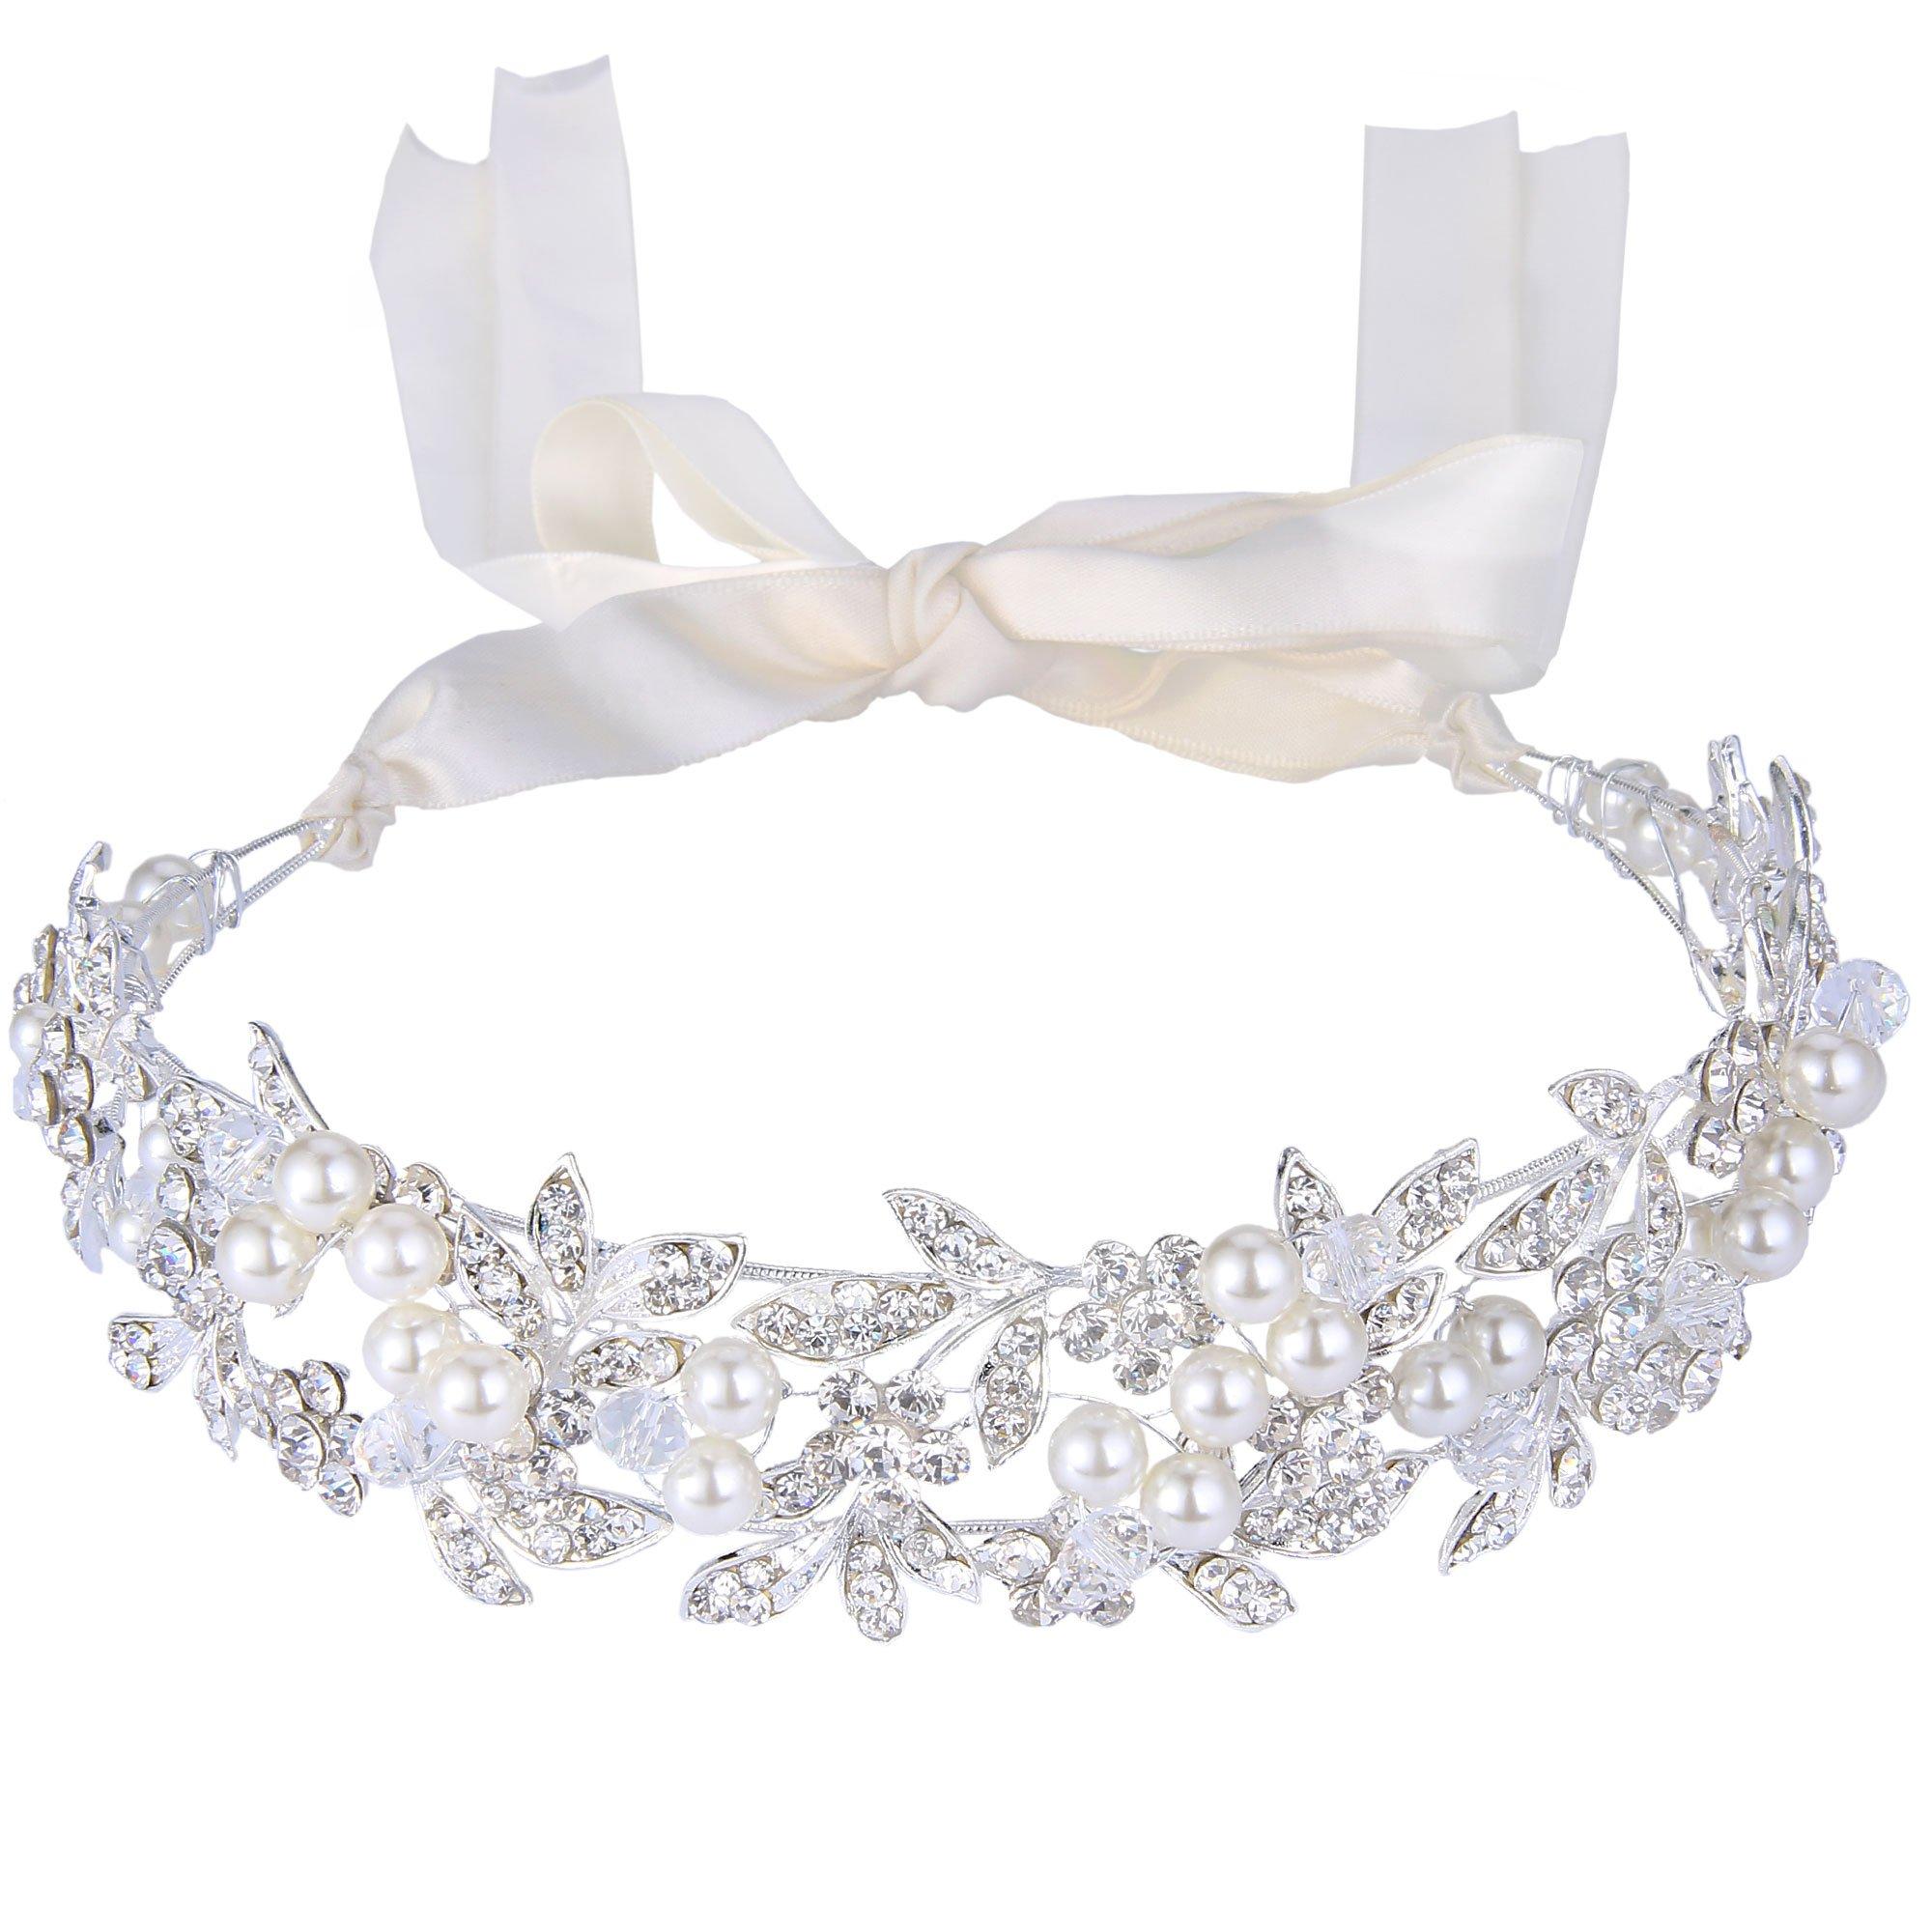 BriLove Wedding Hair Accessories Bridal Headband for Women Bohemian Crystal Ivory Color Simulated Pearl Bib Ribbon Tie Bendable Headband Clear Silver-Tone